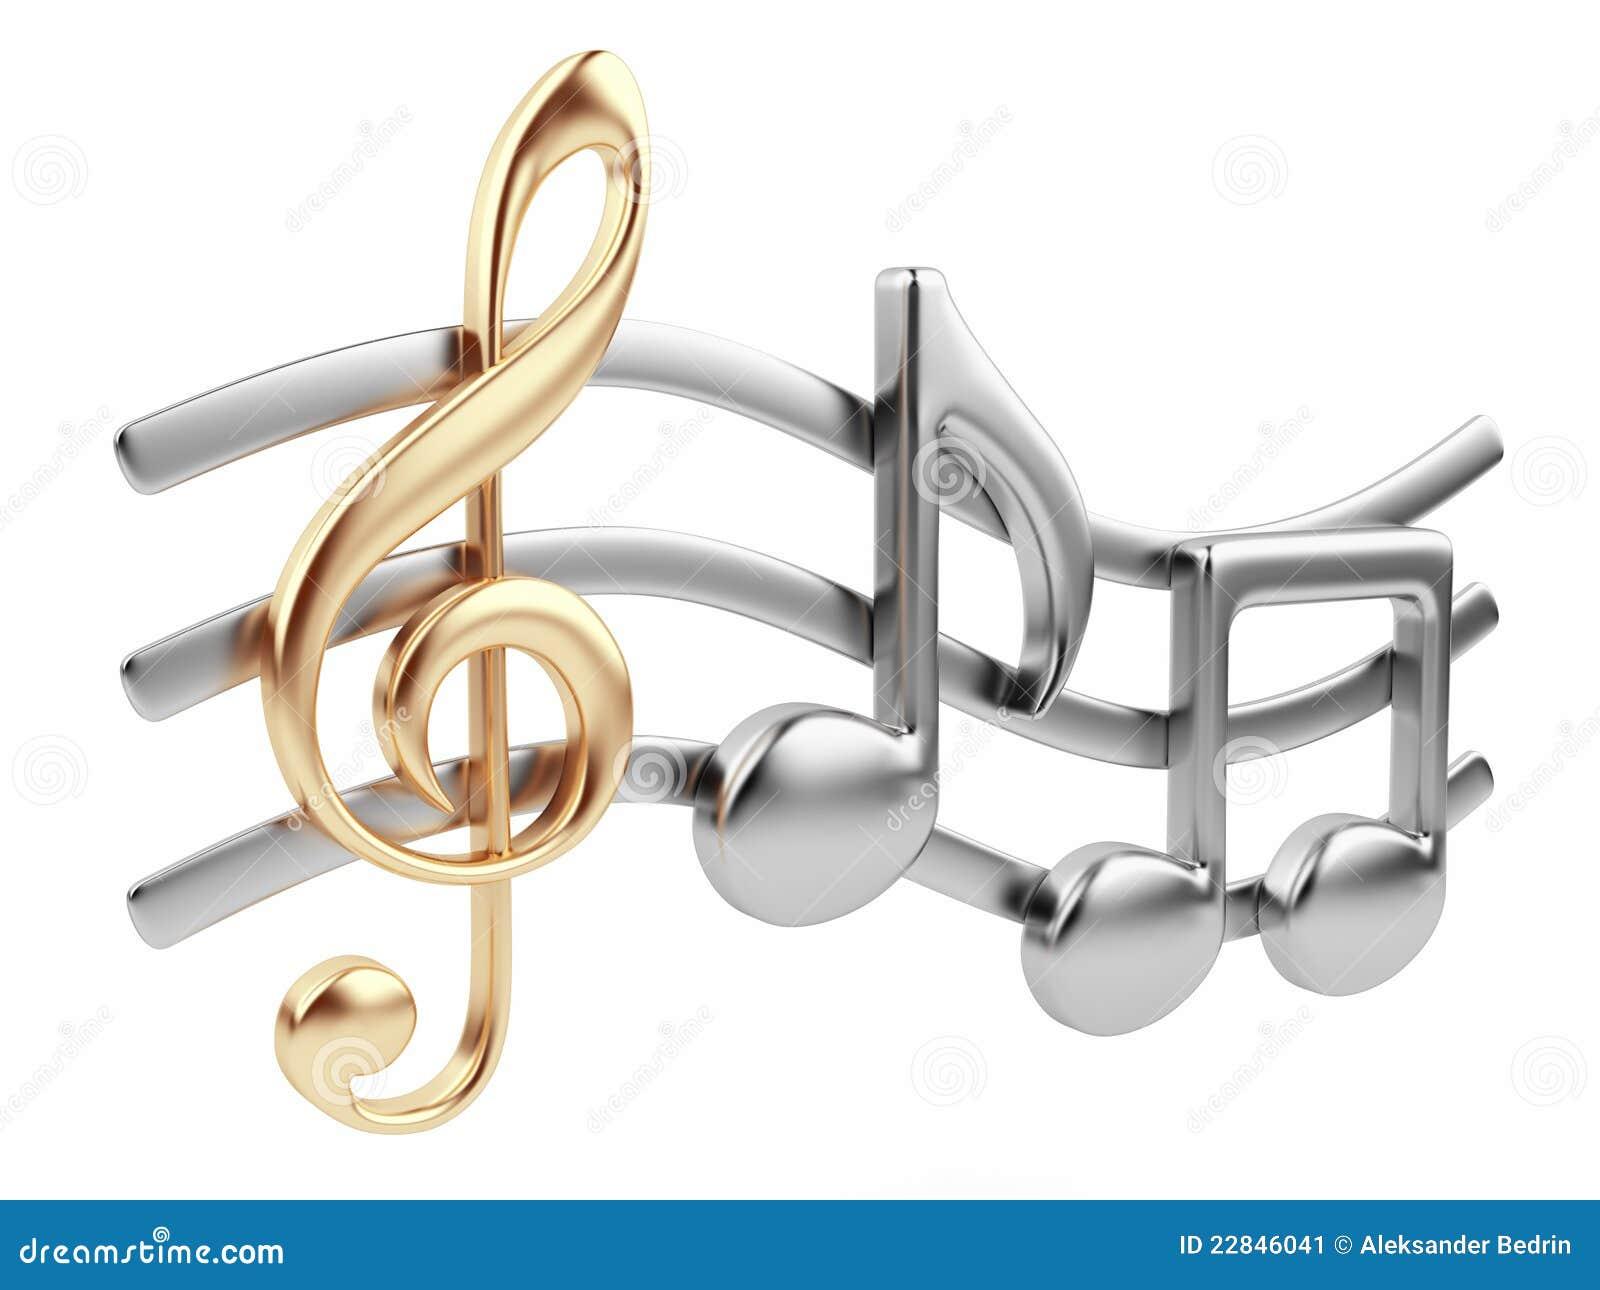 Nota 3D de la música. Composición de música. Aislado